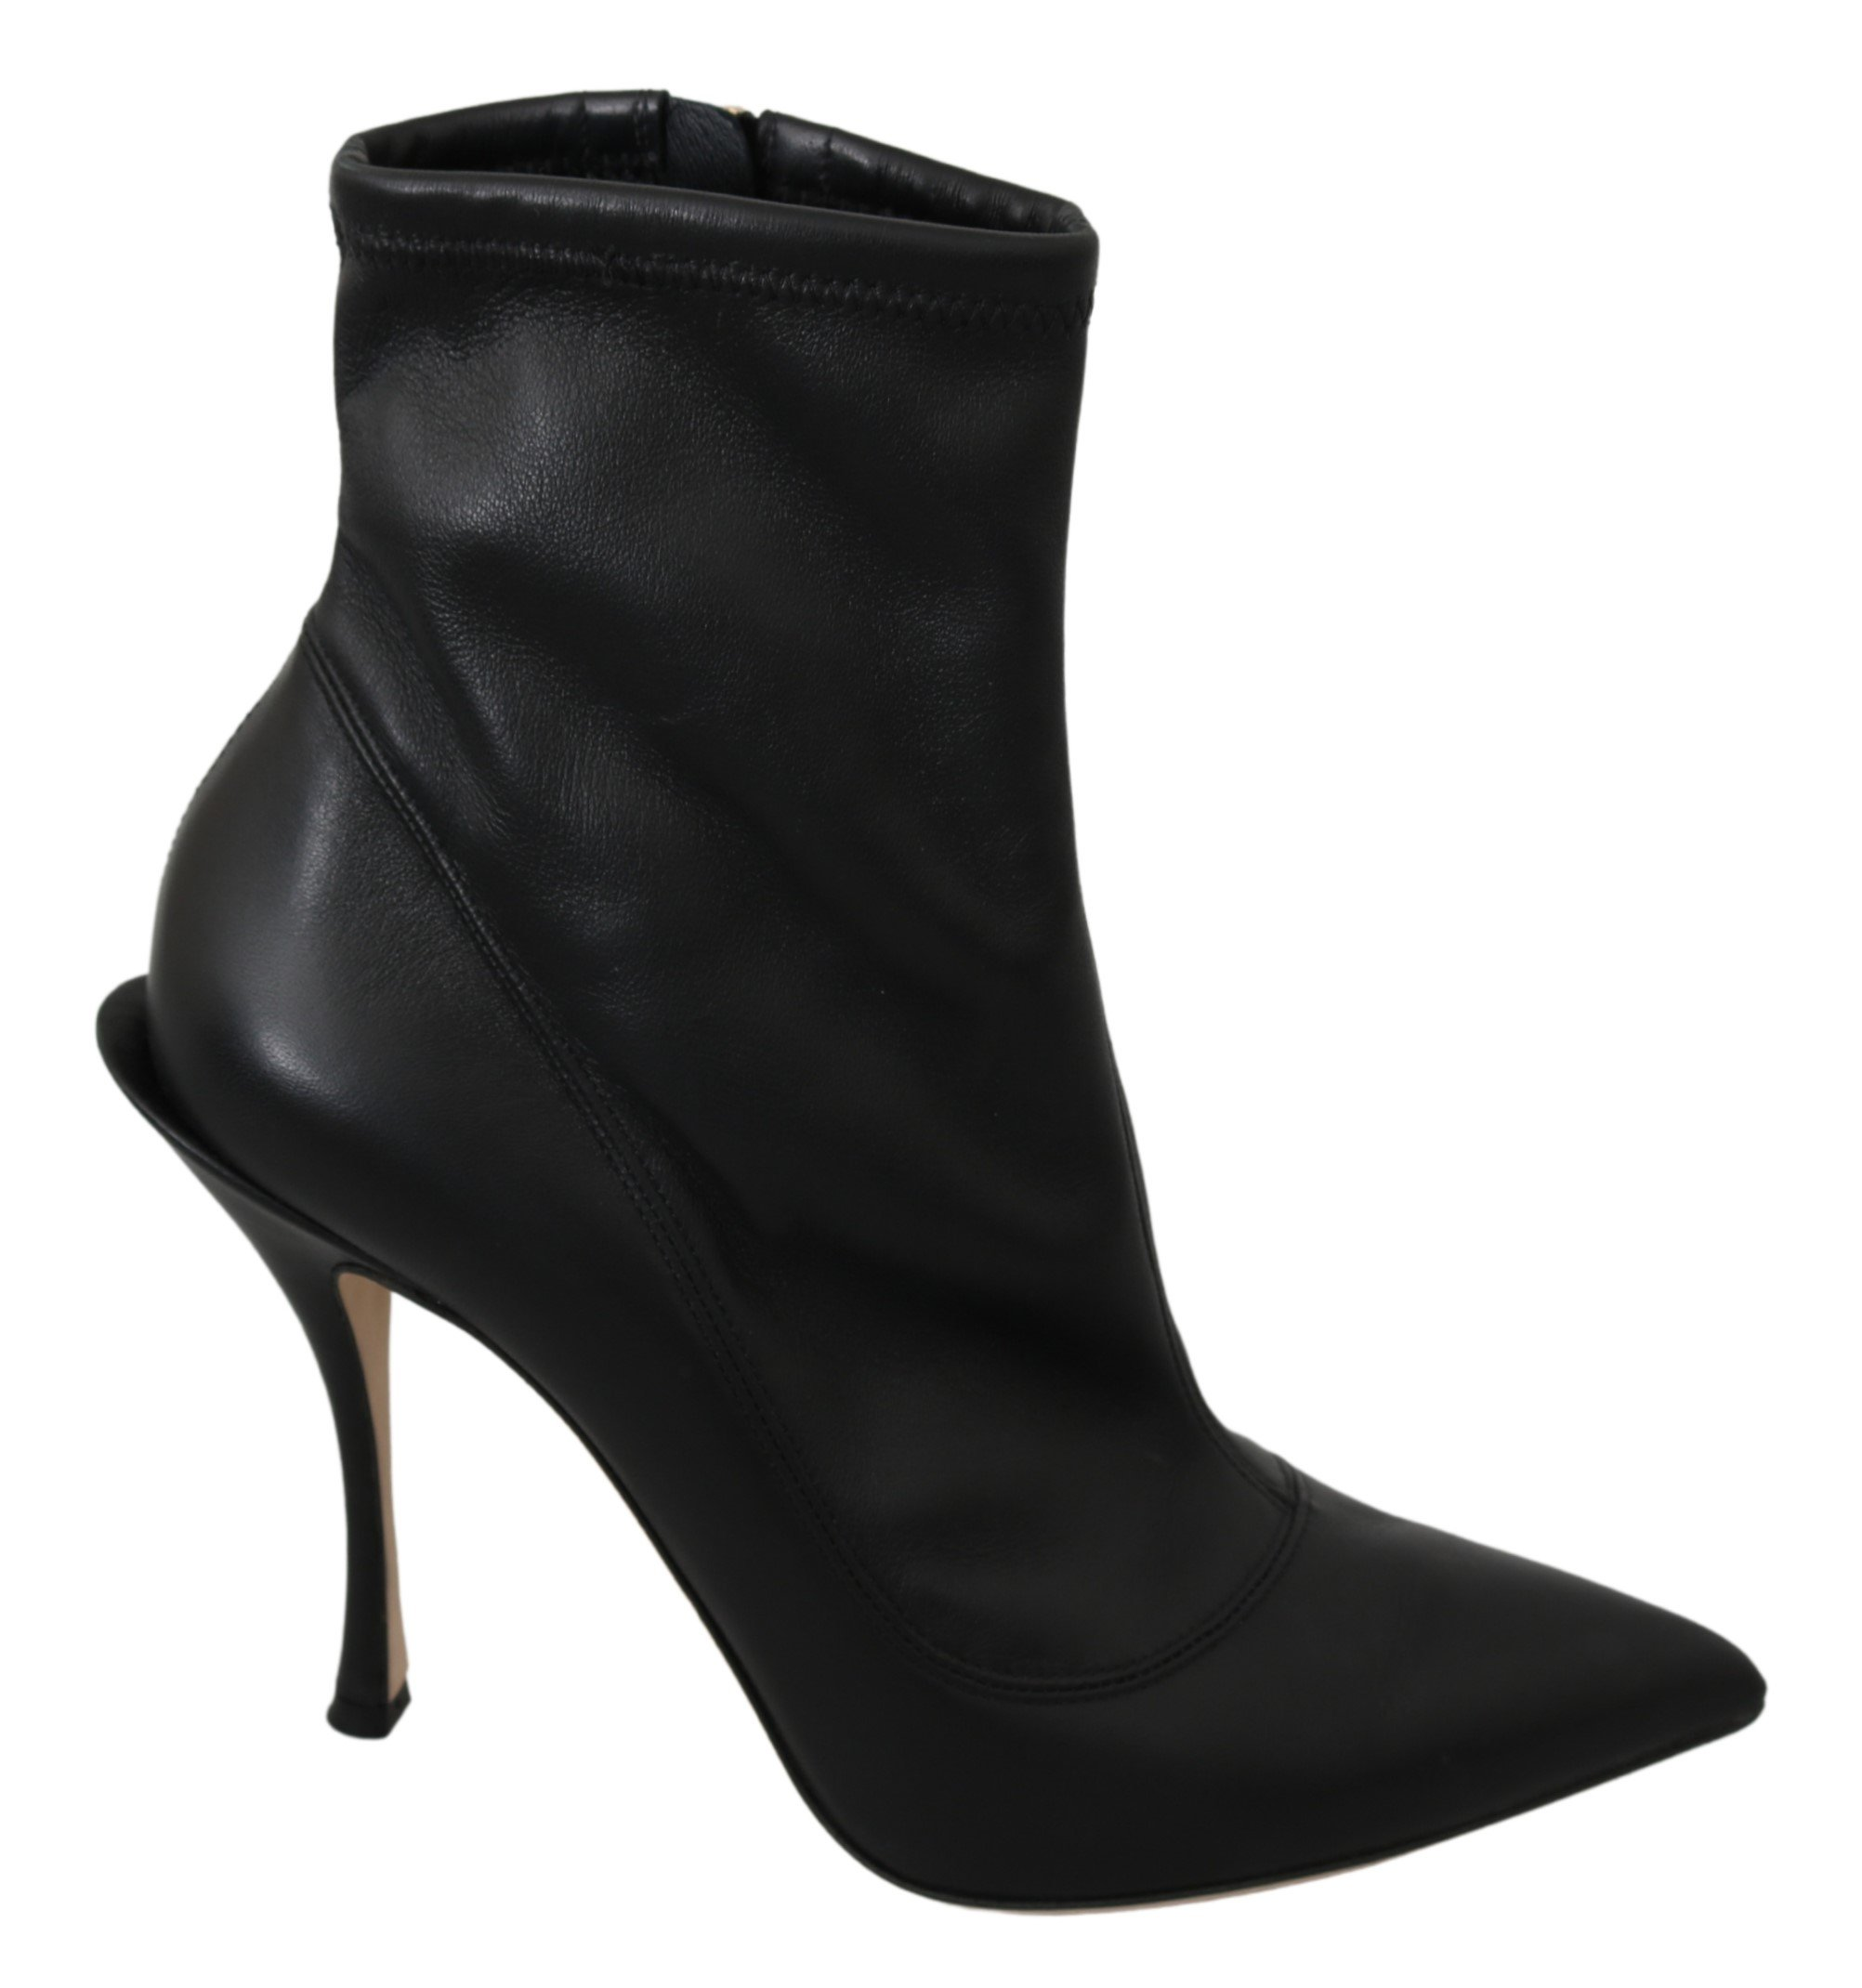 Dolce & Gabbana Women's Leather Ankle High Heel Boots Black LA7049 - EU39/US8.5